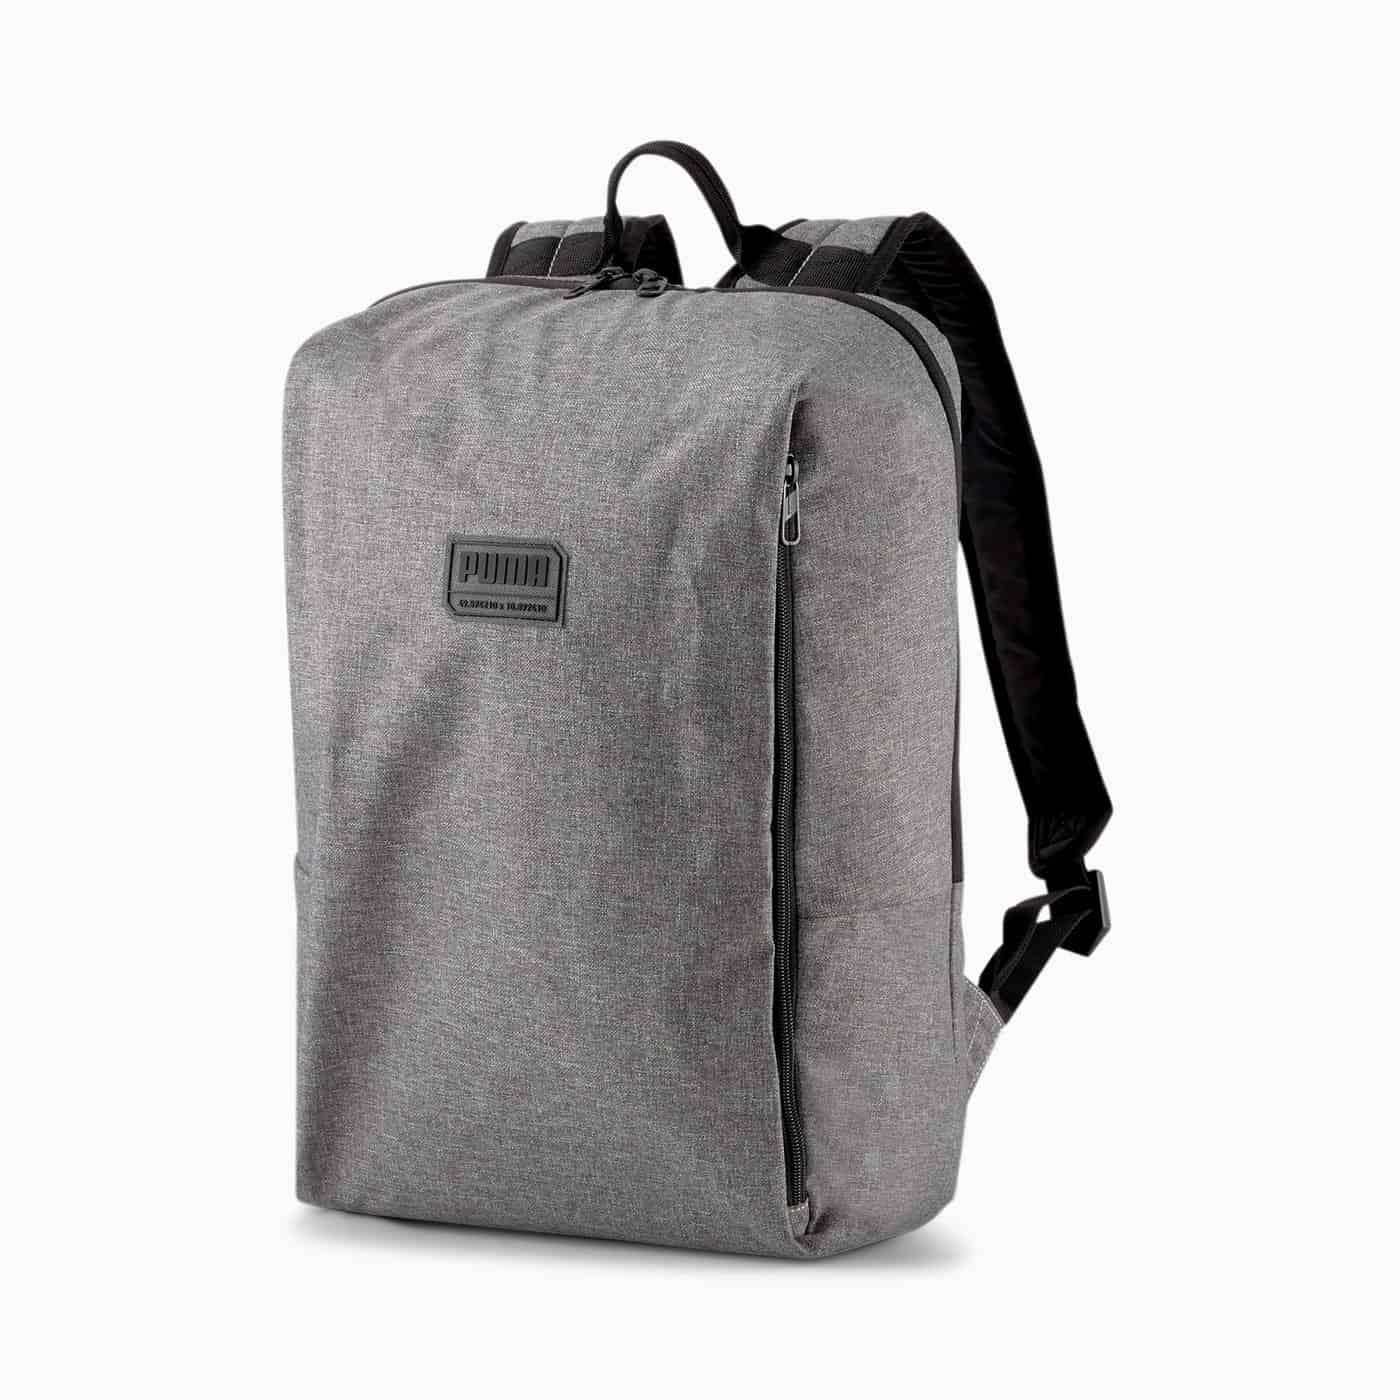 PUMA City Backpack | PUMA US